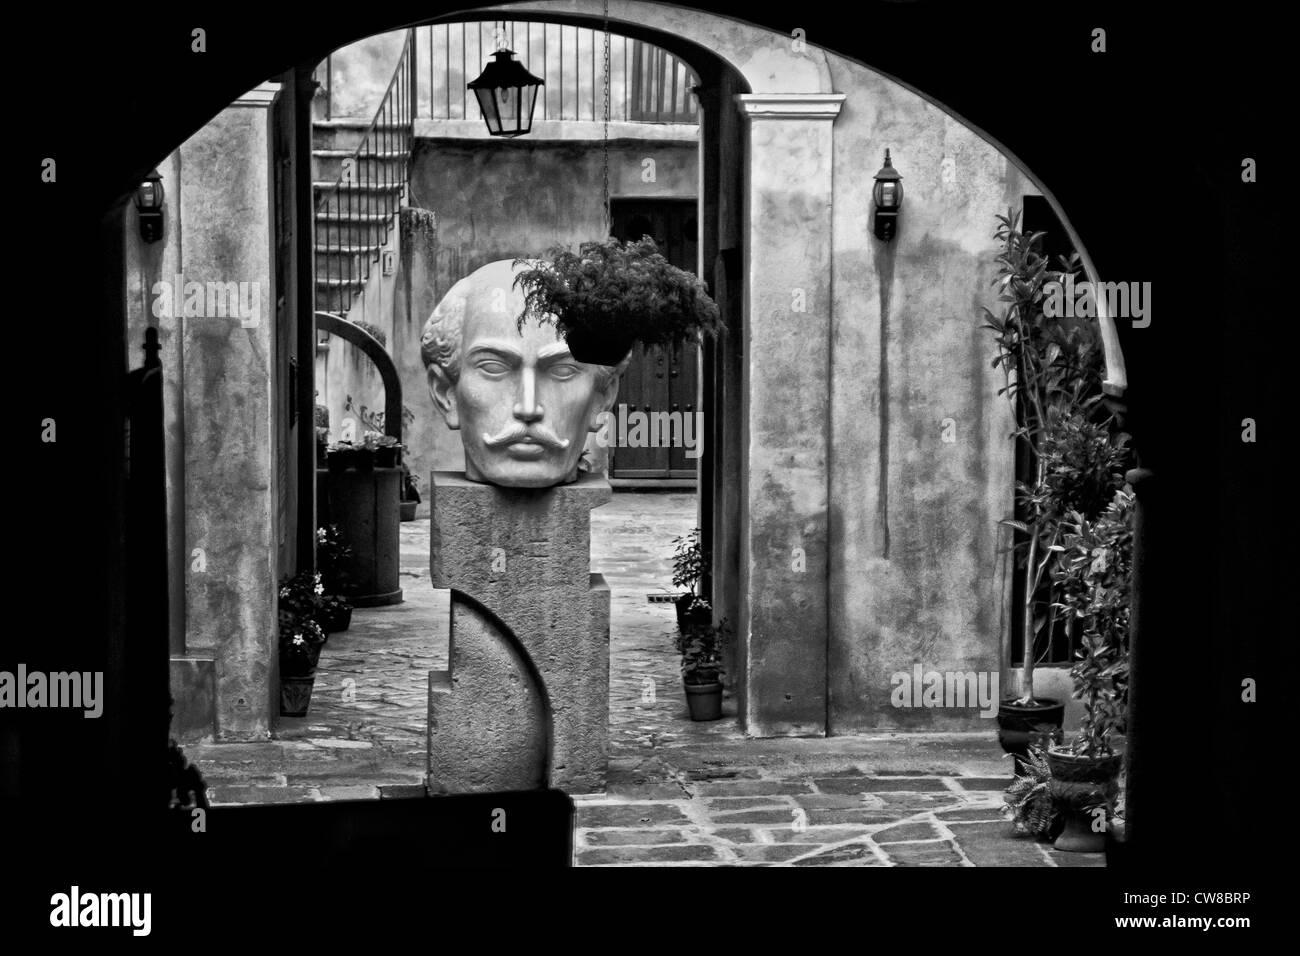 Statue in Puebla, Mexico - Stock Image